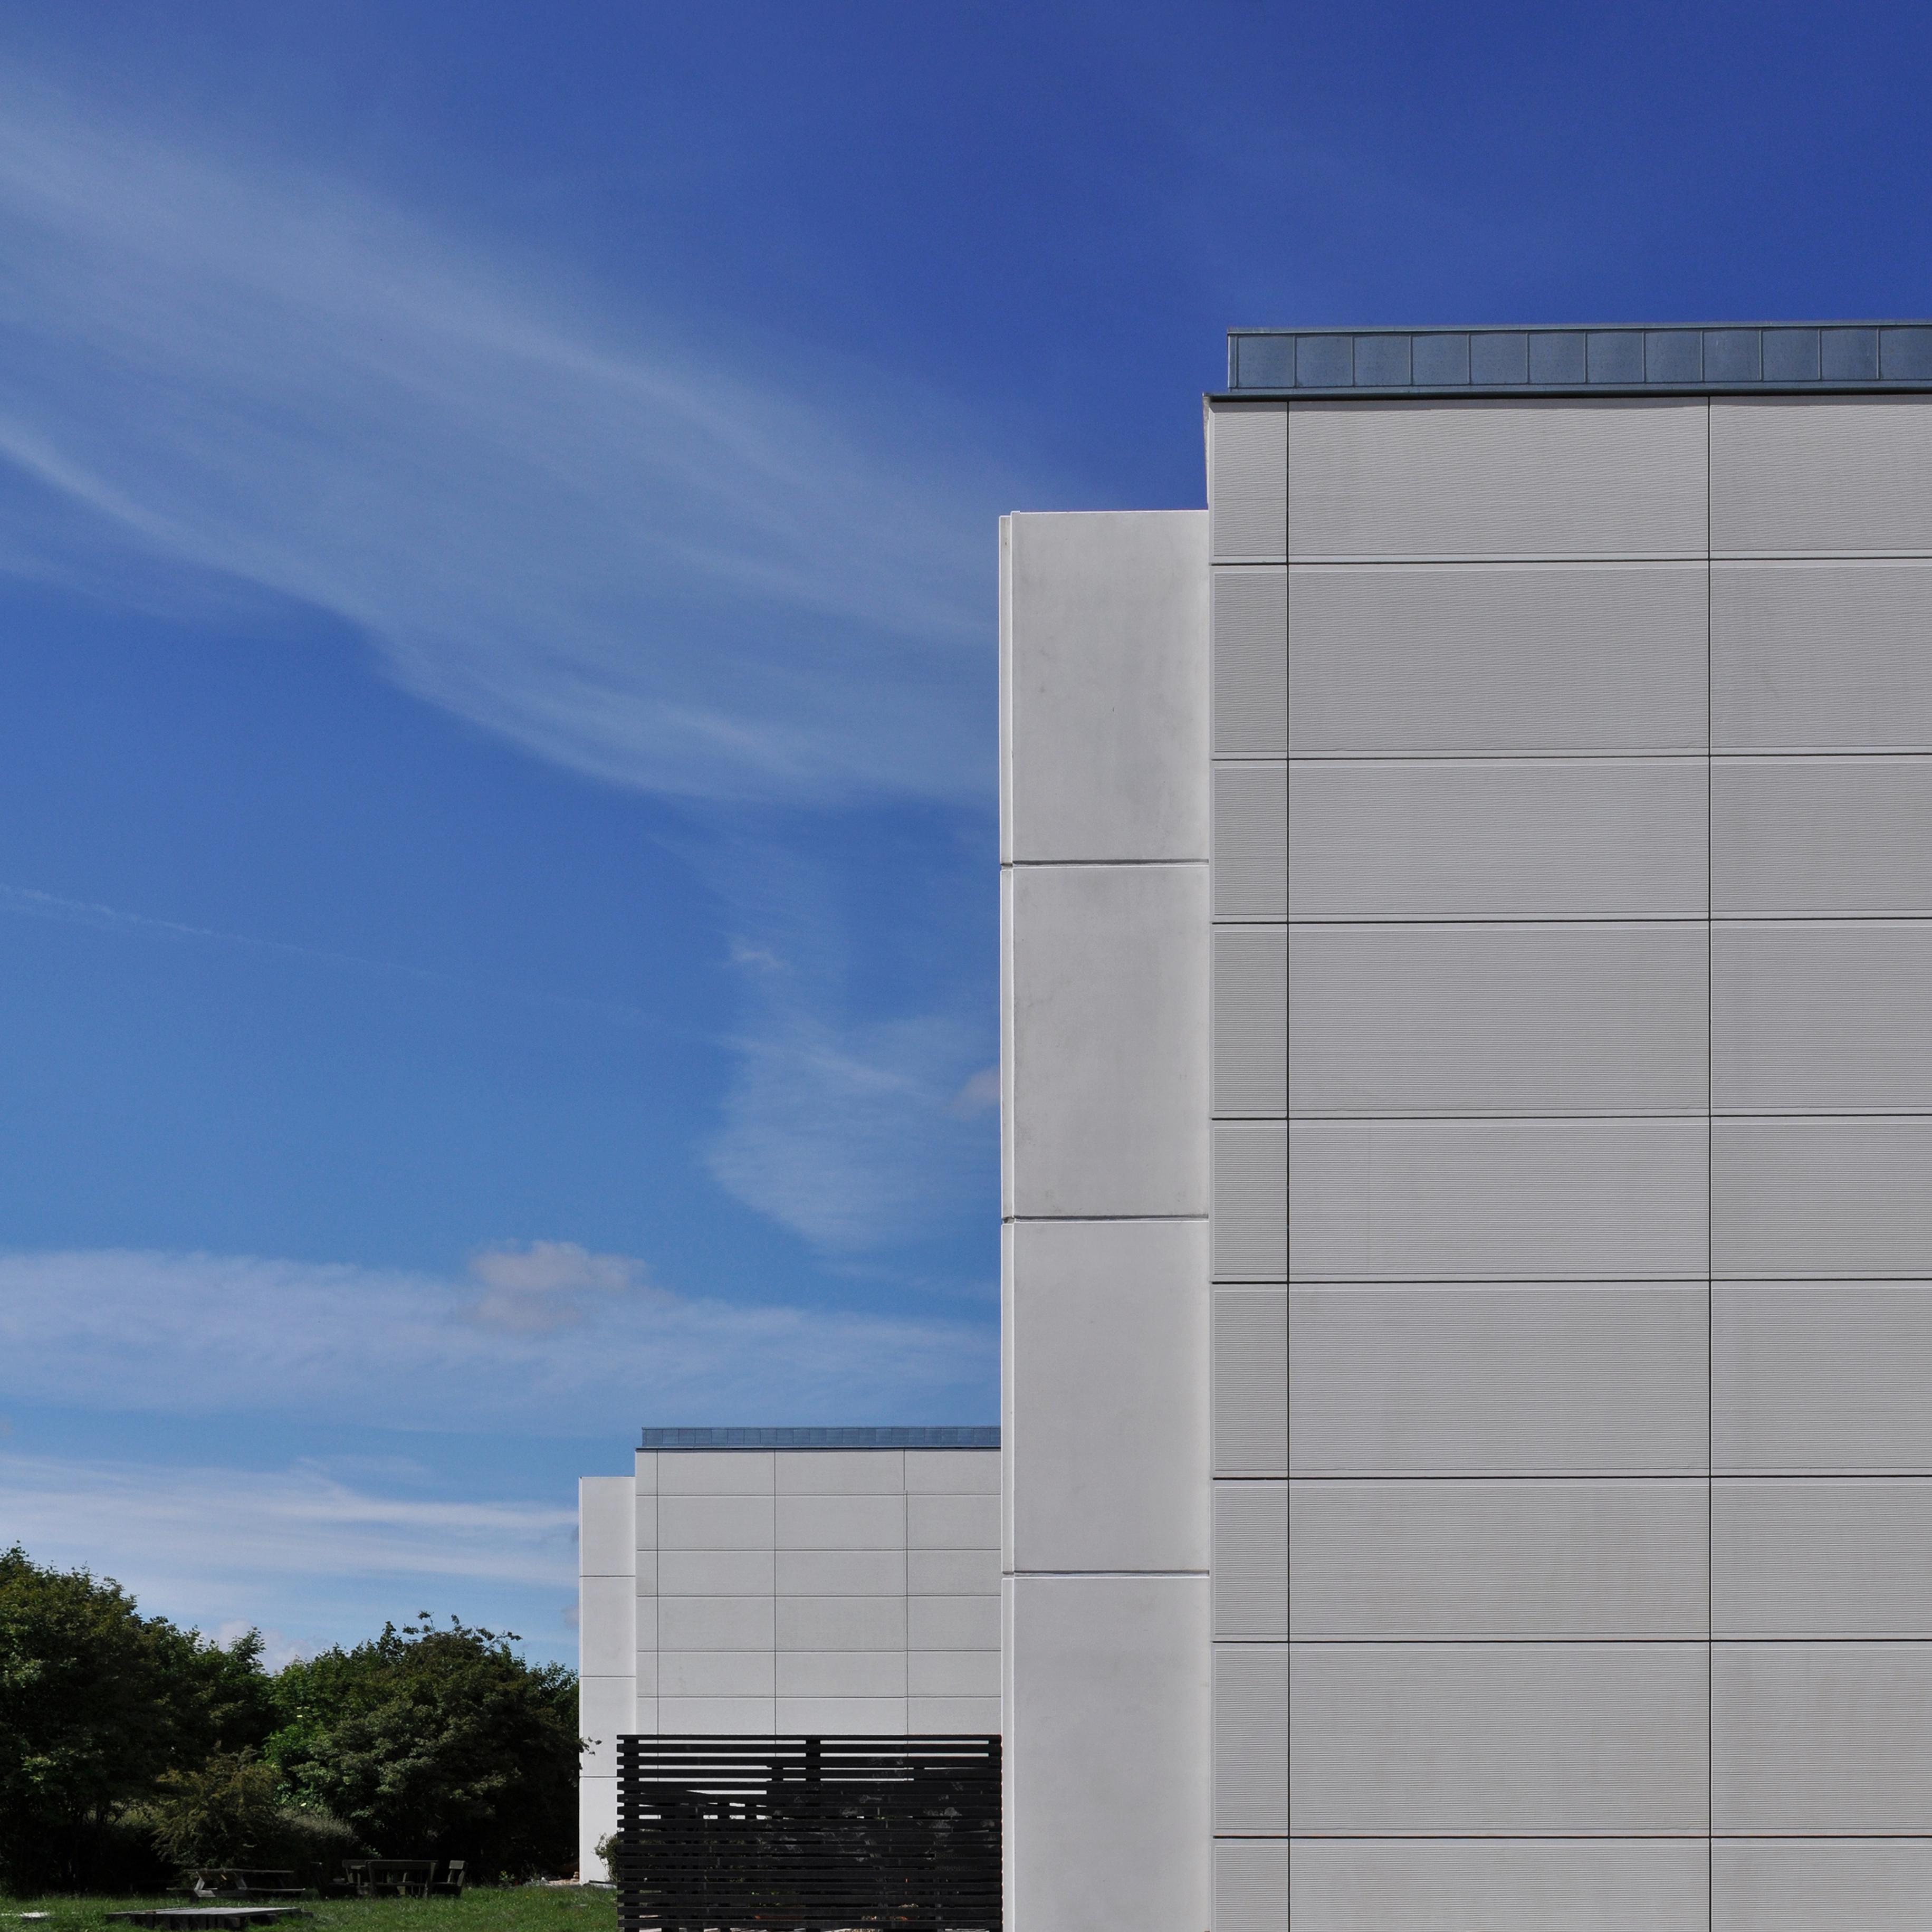 File:New Concrete Facades. Renovation Of Gyldenrisparken